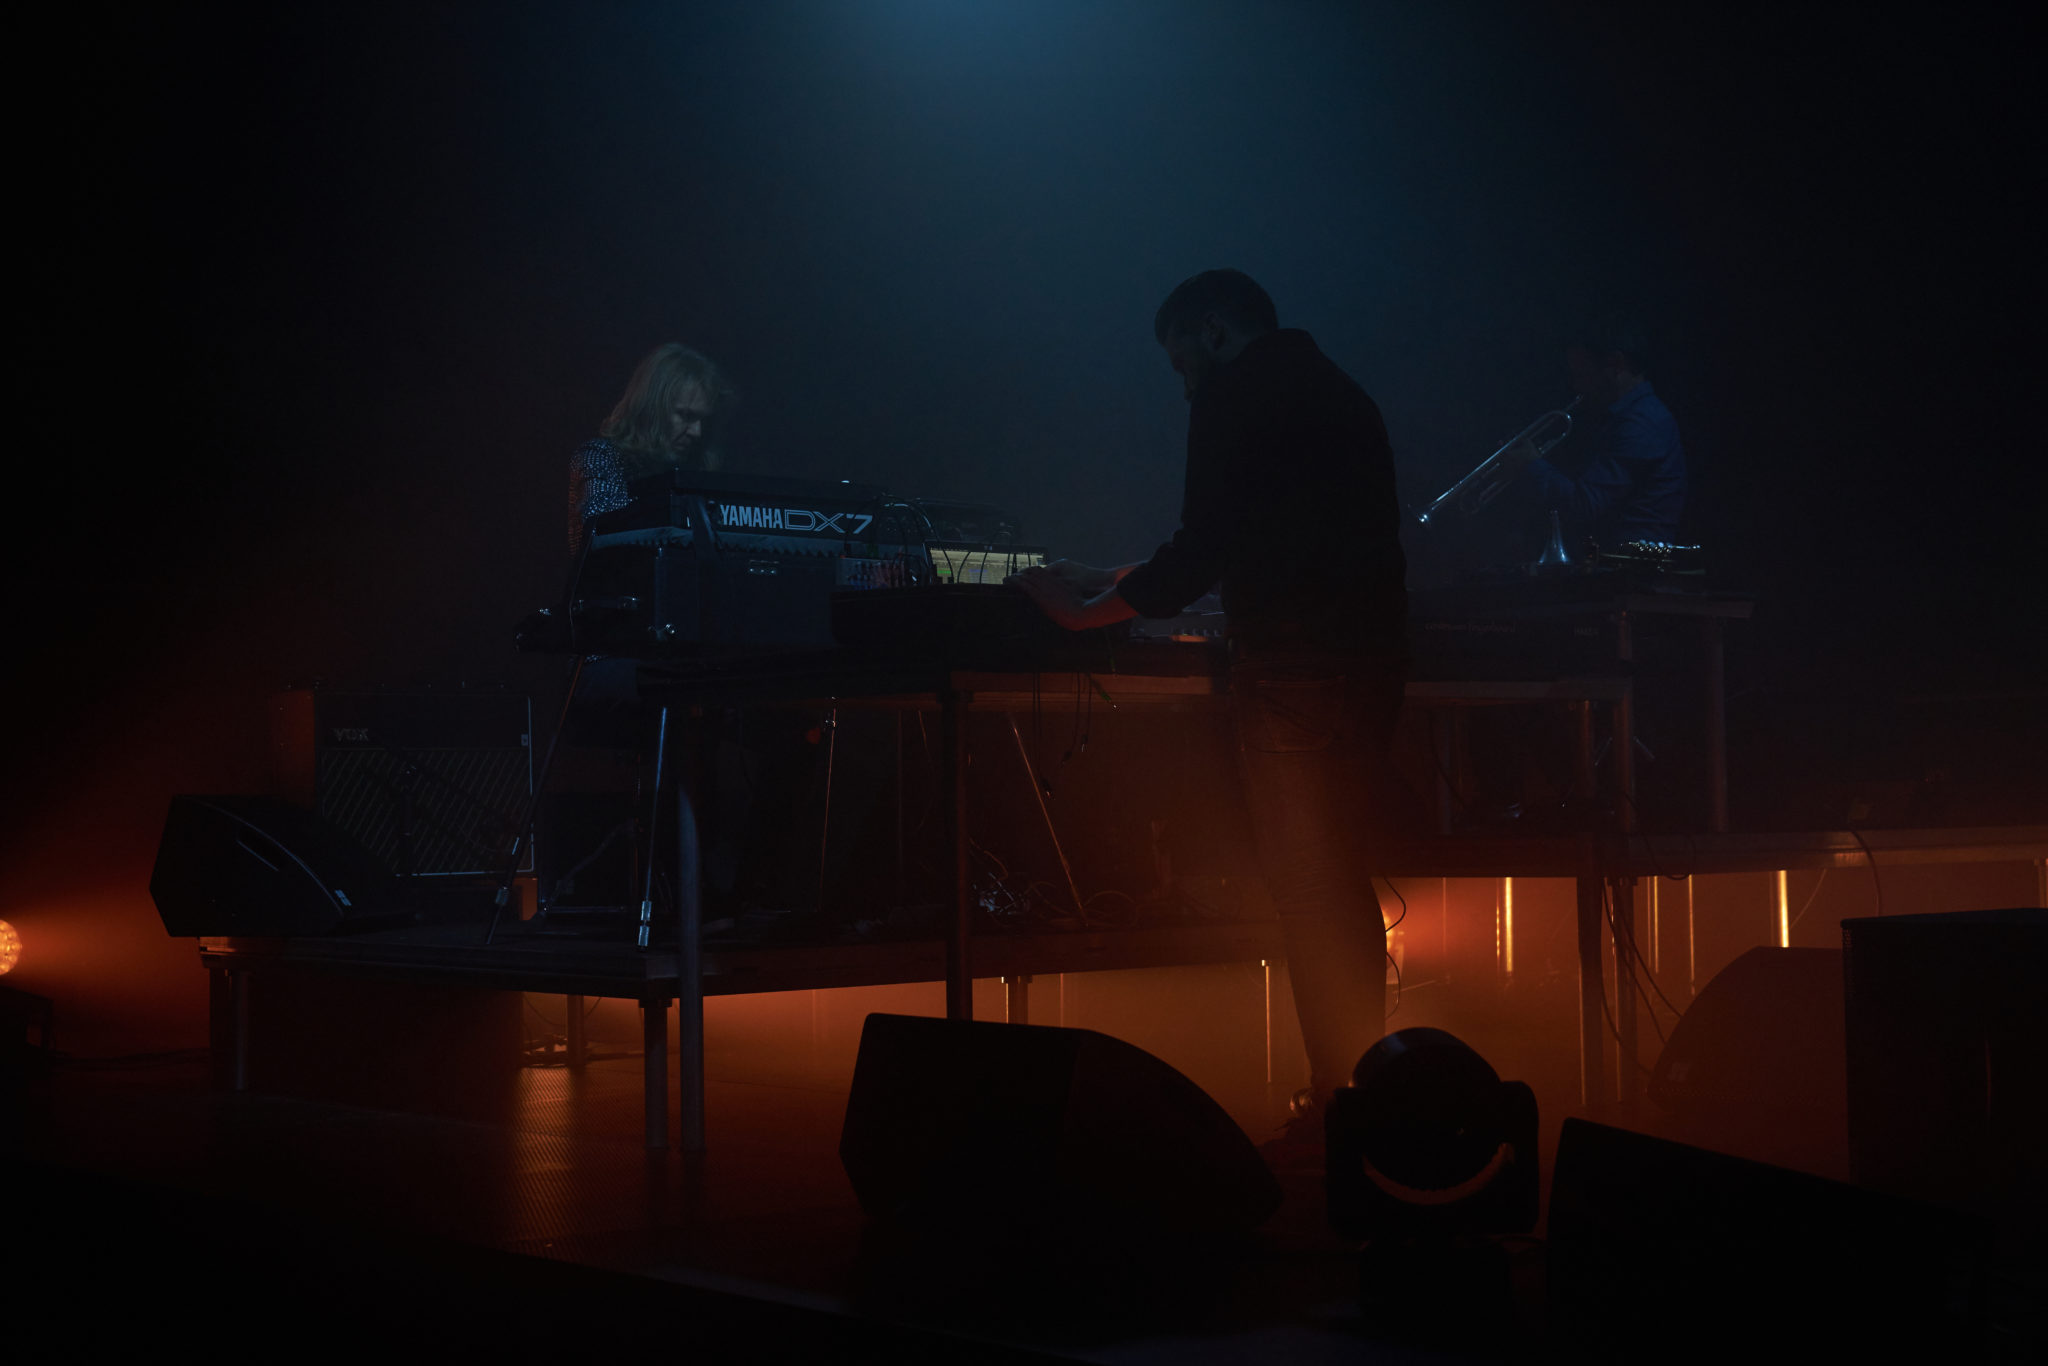 Supersilent Jubileum Concert - 09/09/17 Ultima 2017. Photo © Andreas Turau